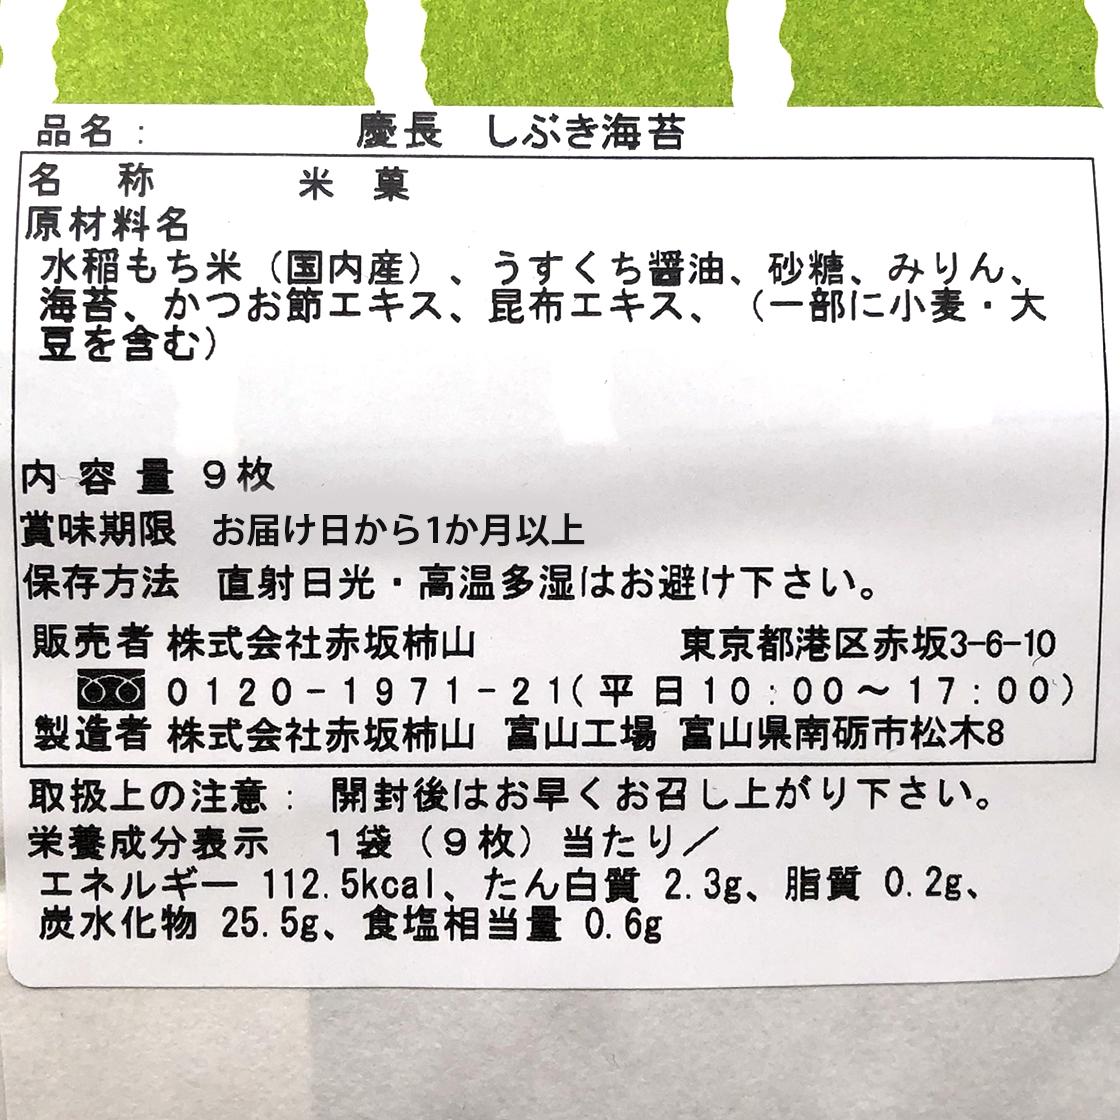 立ち袋/3種類[赤坂柿山] 23